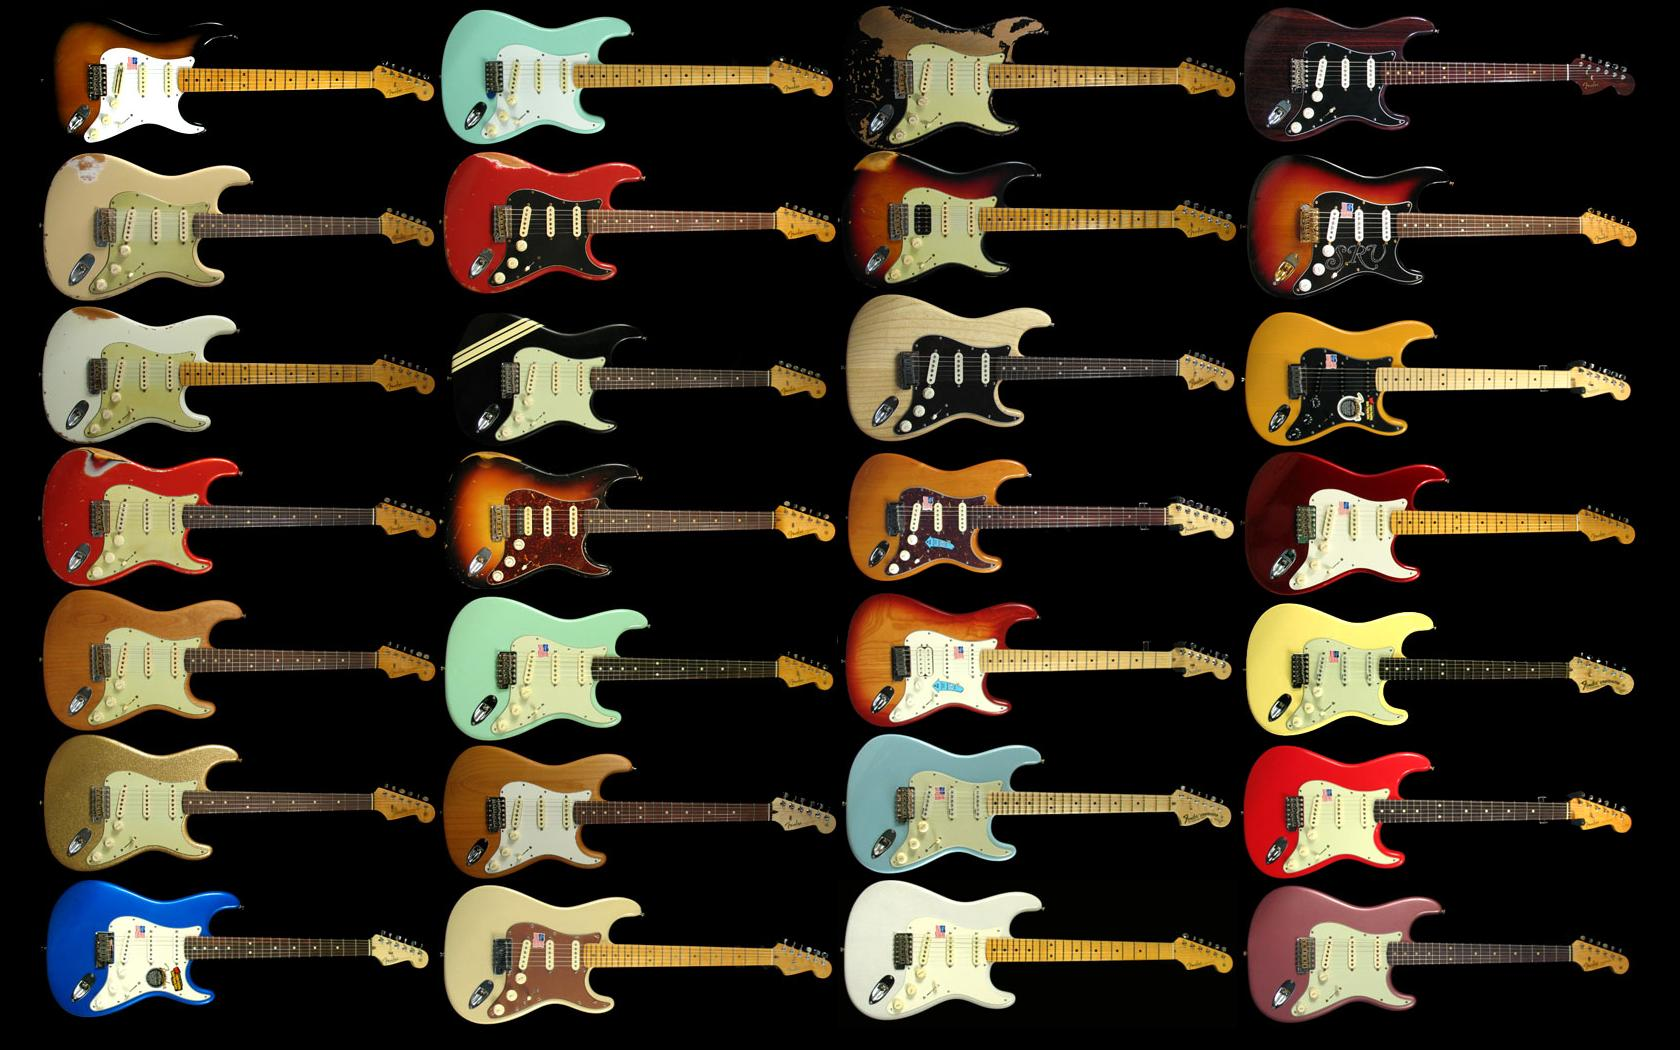 Guitar Fender Wallpaper 27004 Hd Wallpapers in Music   Imagescicom 1680x1050